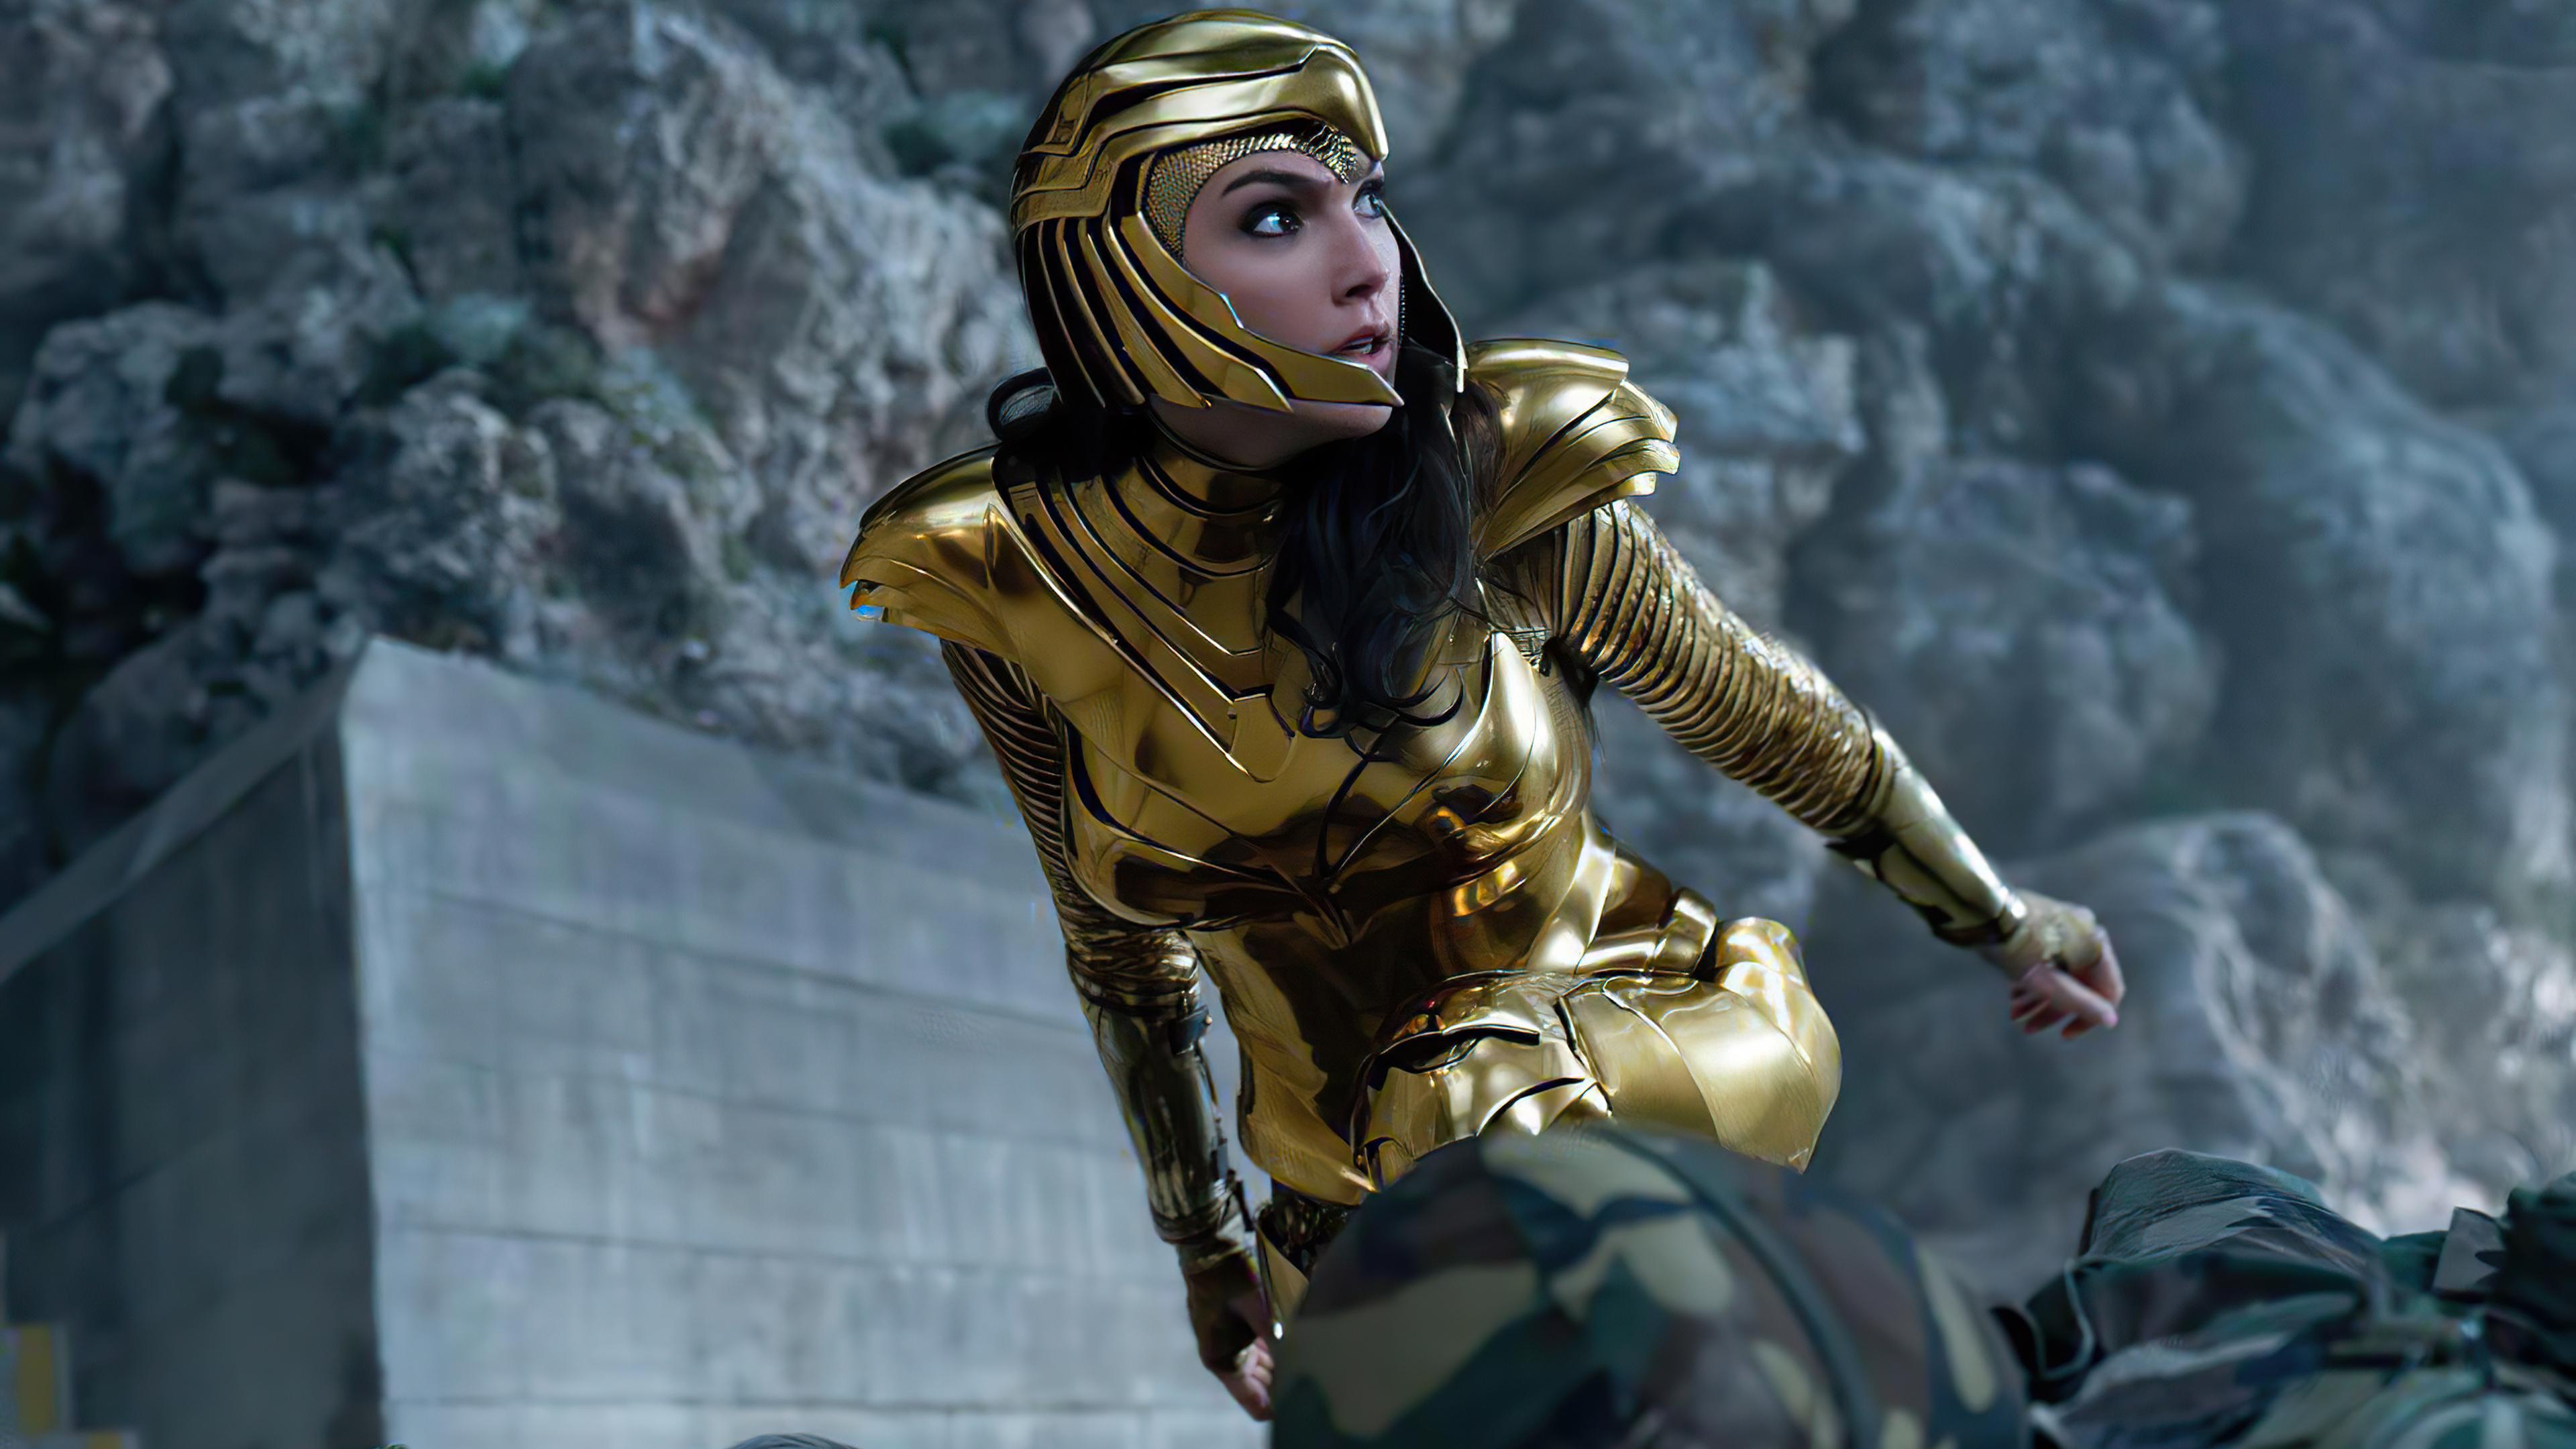 wonder woman 1984 gold suit 4k 1611597608 - Wonder Woman 1984 Gold Suit 4k - Wonder Woman 1984 Gold Suit 4k wallpapers